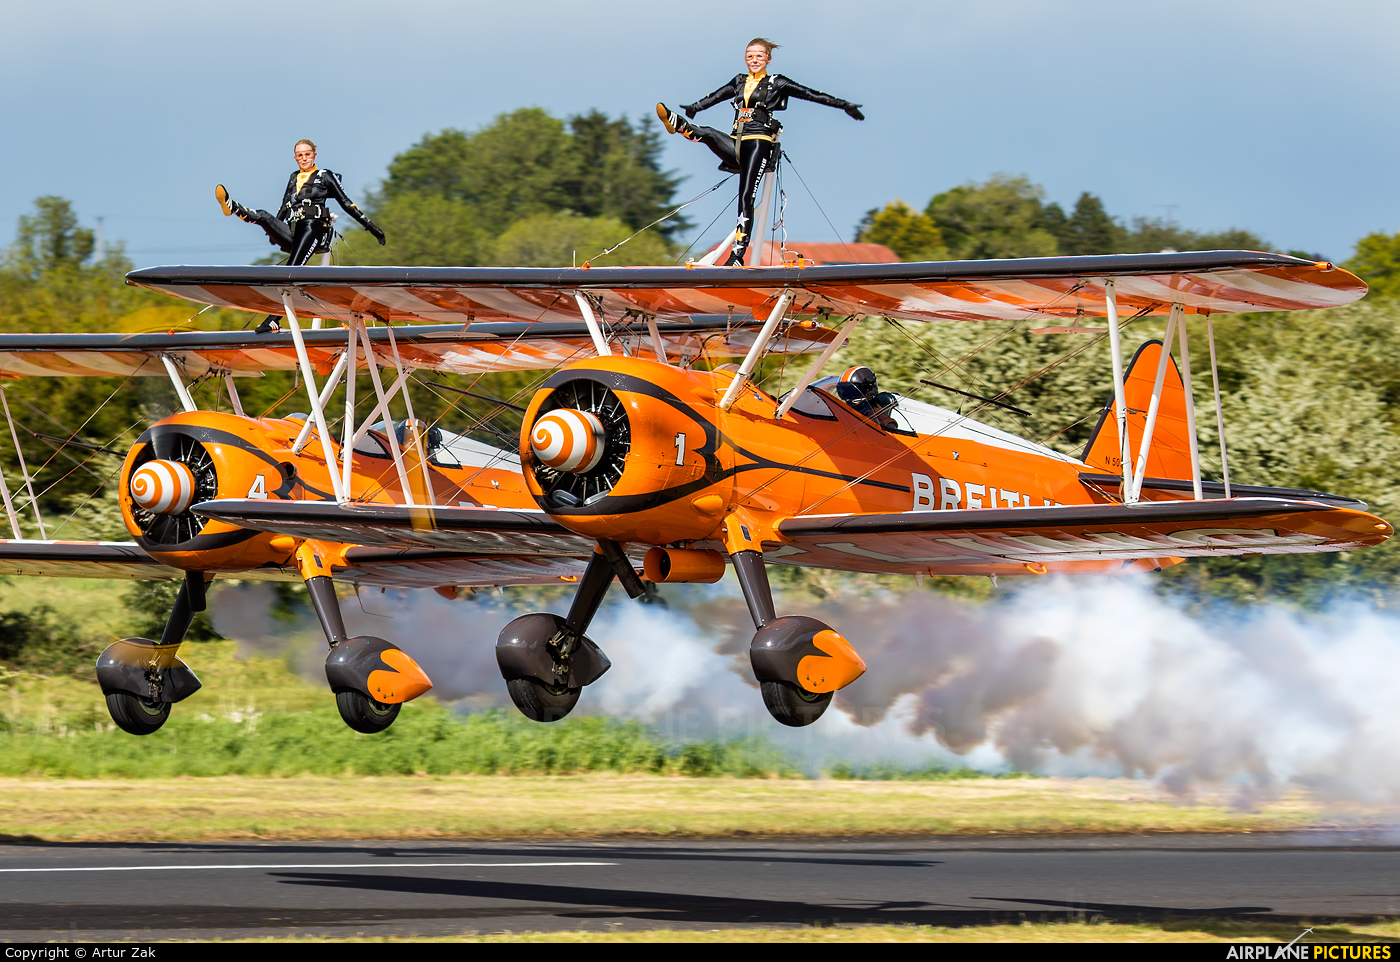 Breitling Wingwalkers N5057V aircraft at Abbeyshrule